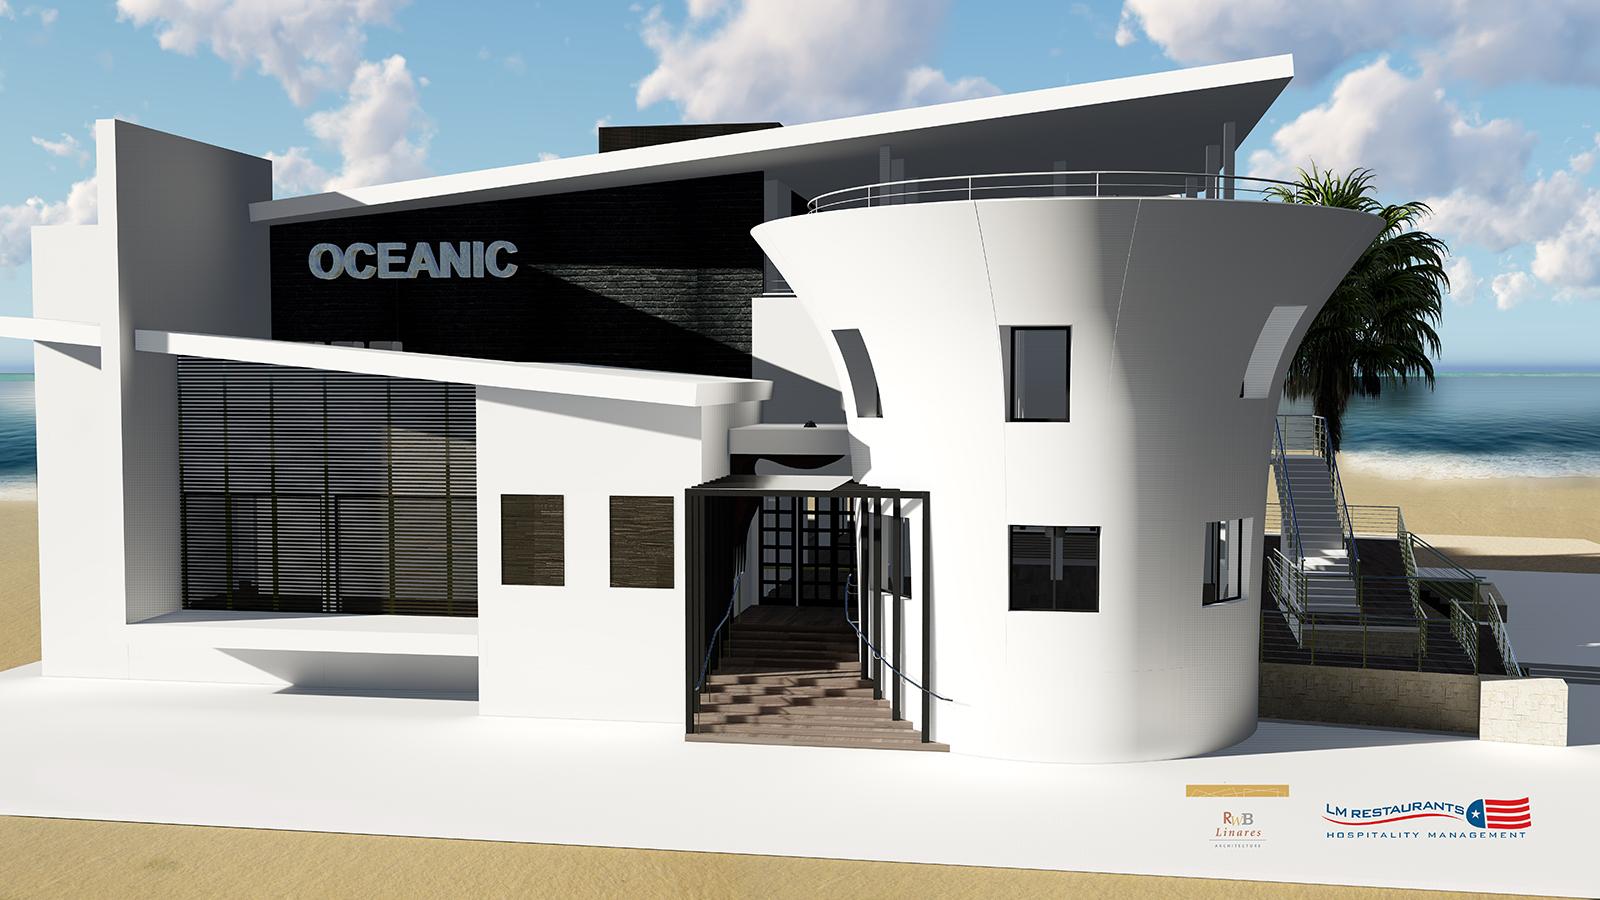 Oceanic Oceanfront Dining